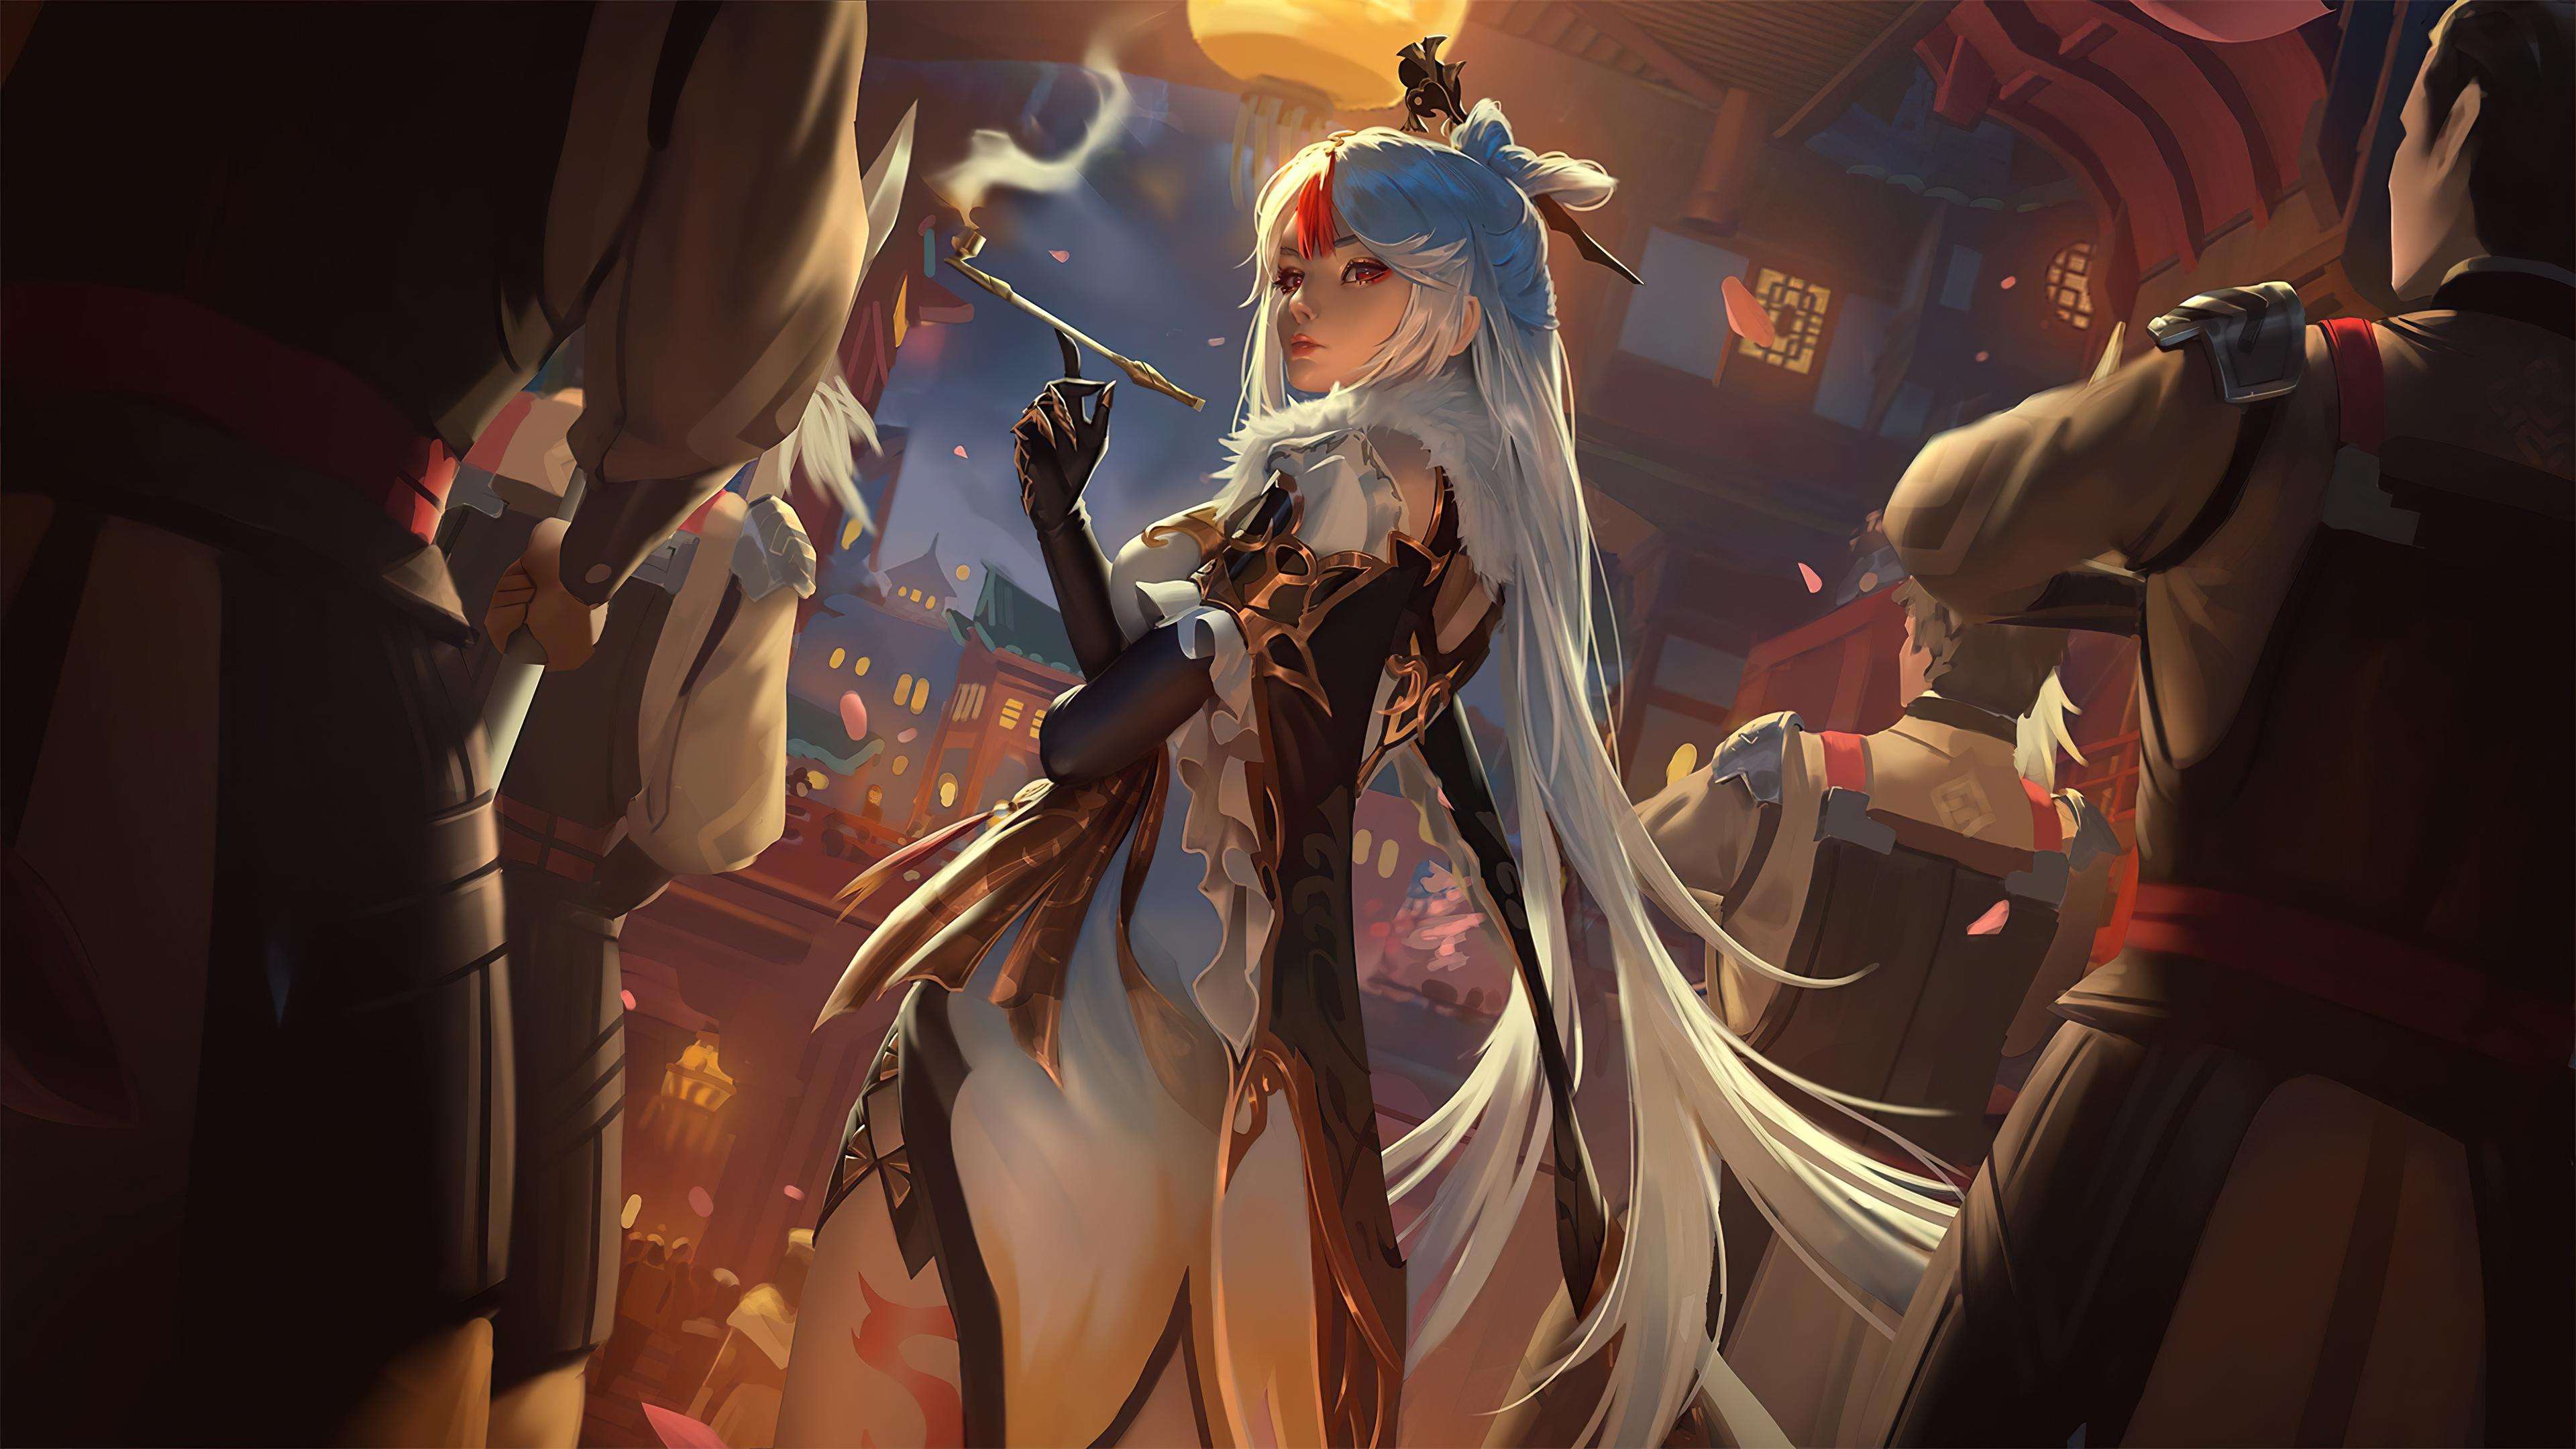 Ningguang From Genshin Impact 4k, HD Games, 4k Wallpapers ...